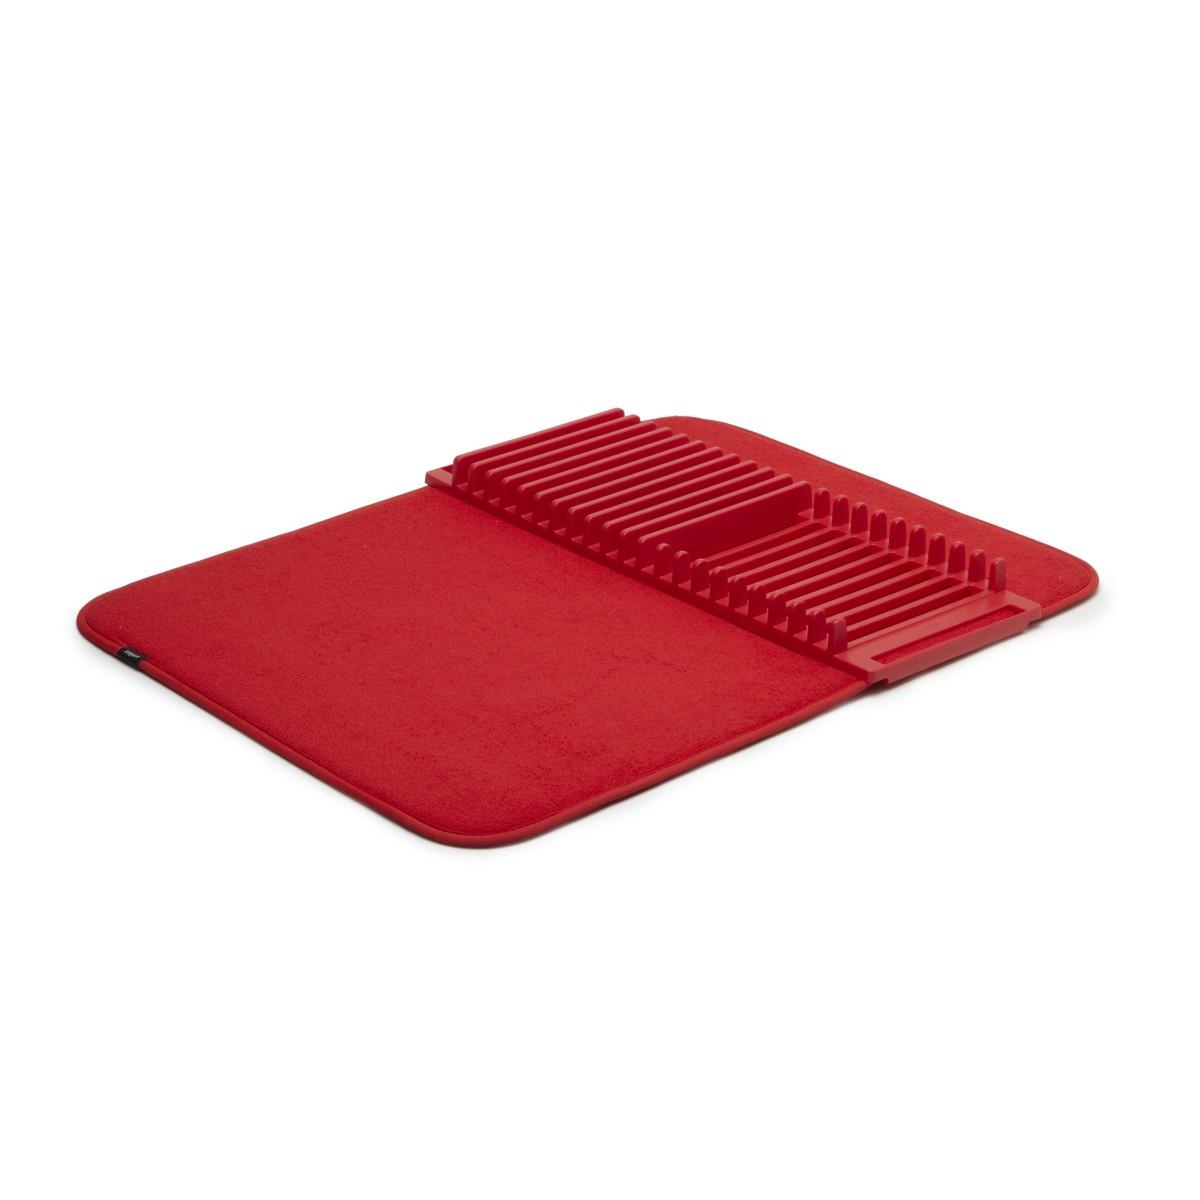 Odkapávač na nádobí Udry červený